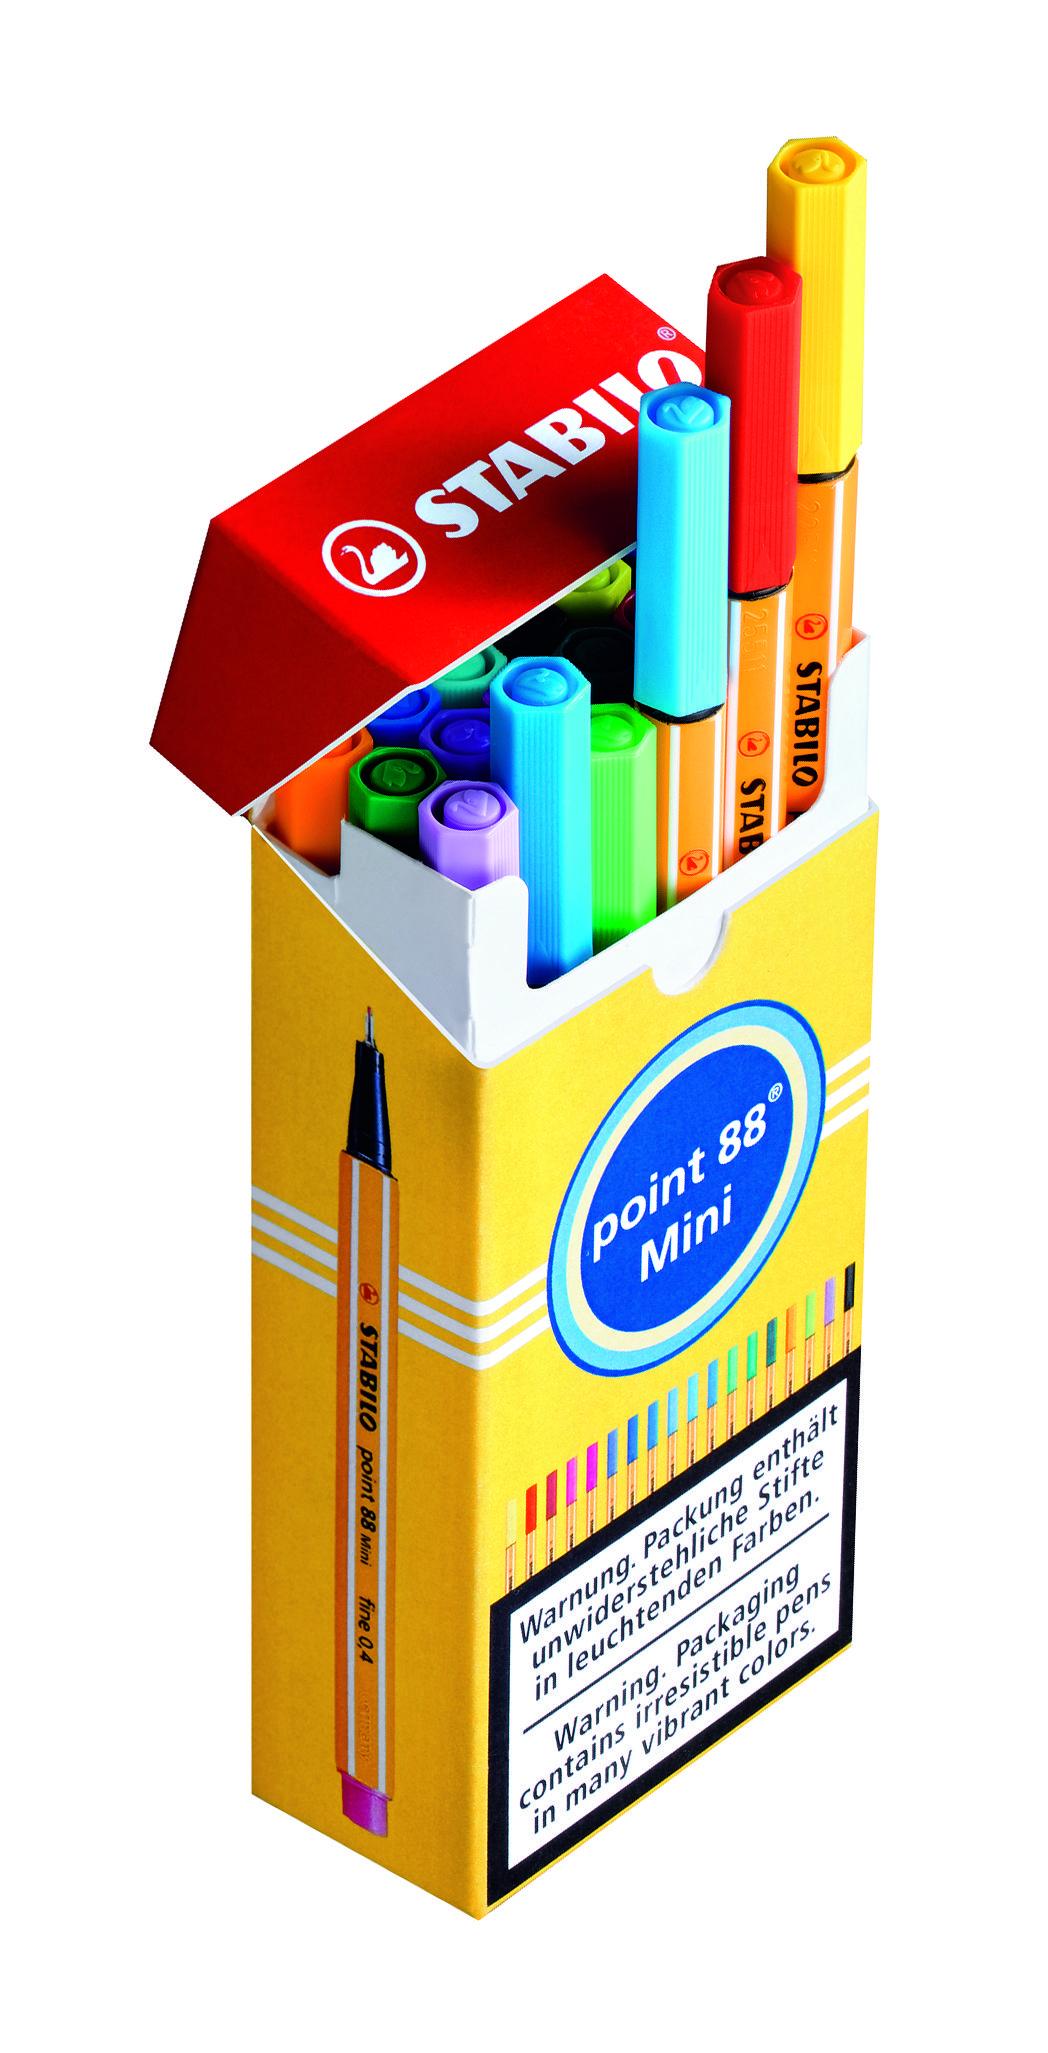 Set of 18 Vivid Colors 4mm Art Pens STABILO Point 88 Mini Fineliner Pens